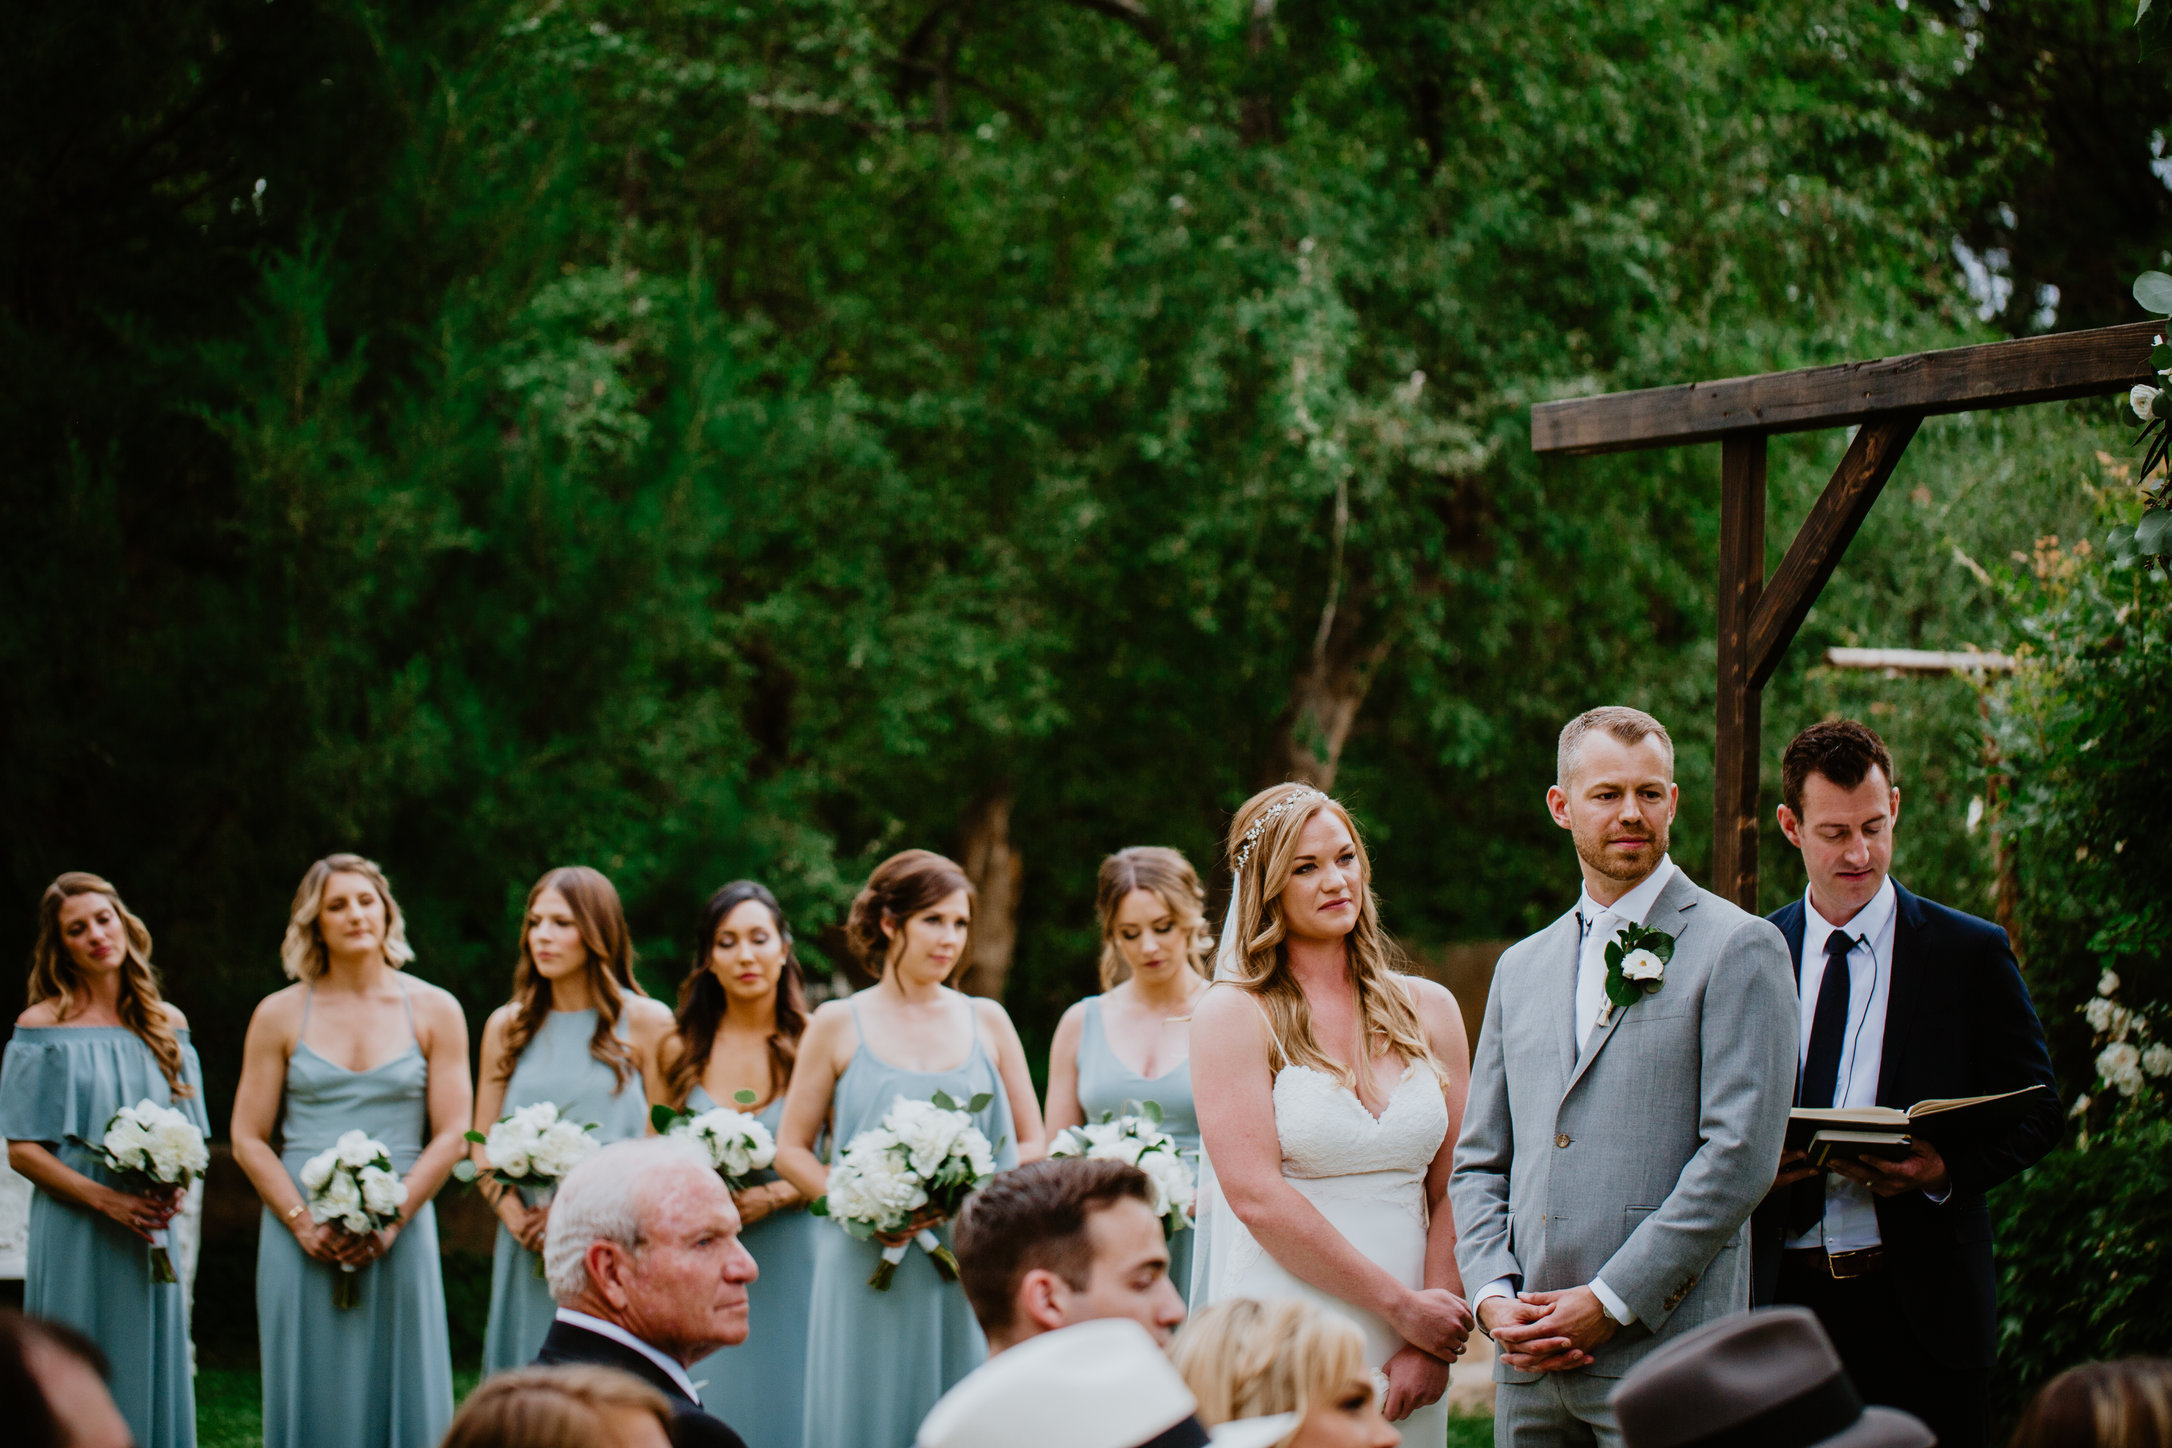 DandA-wedding-245.jpg